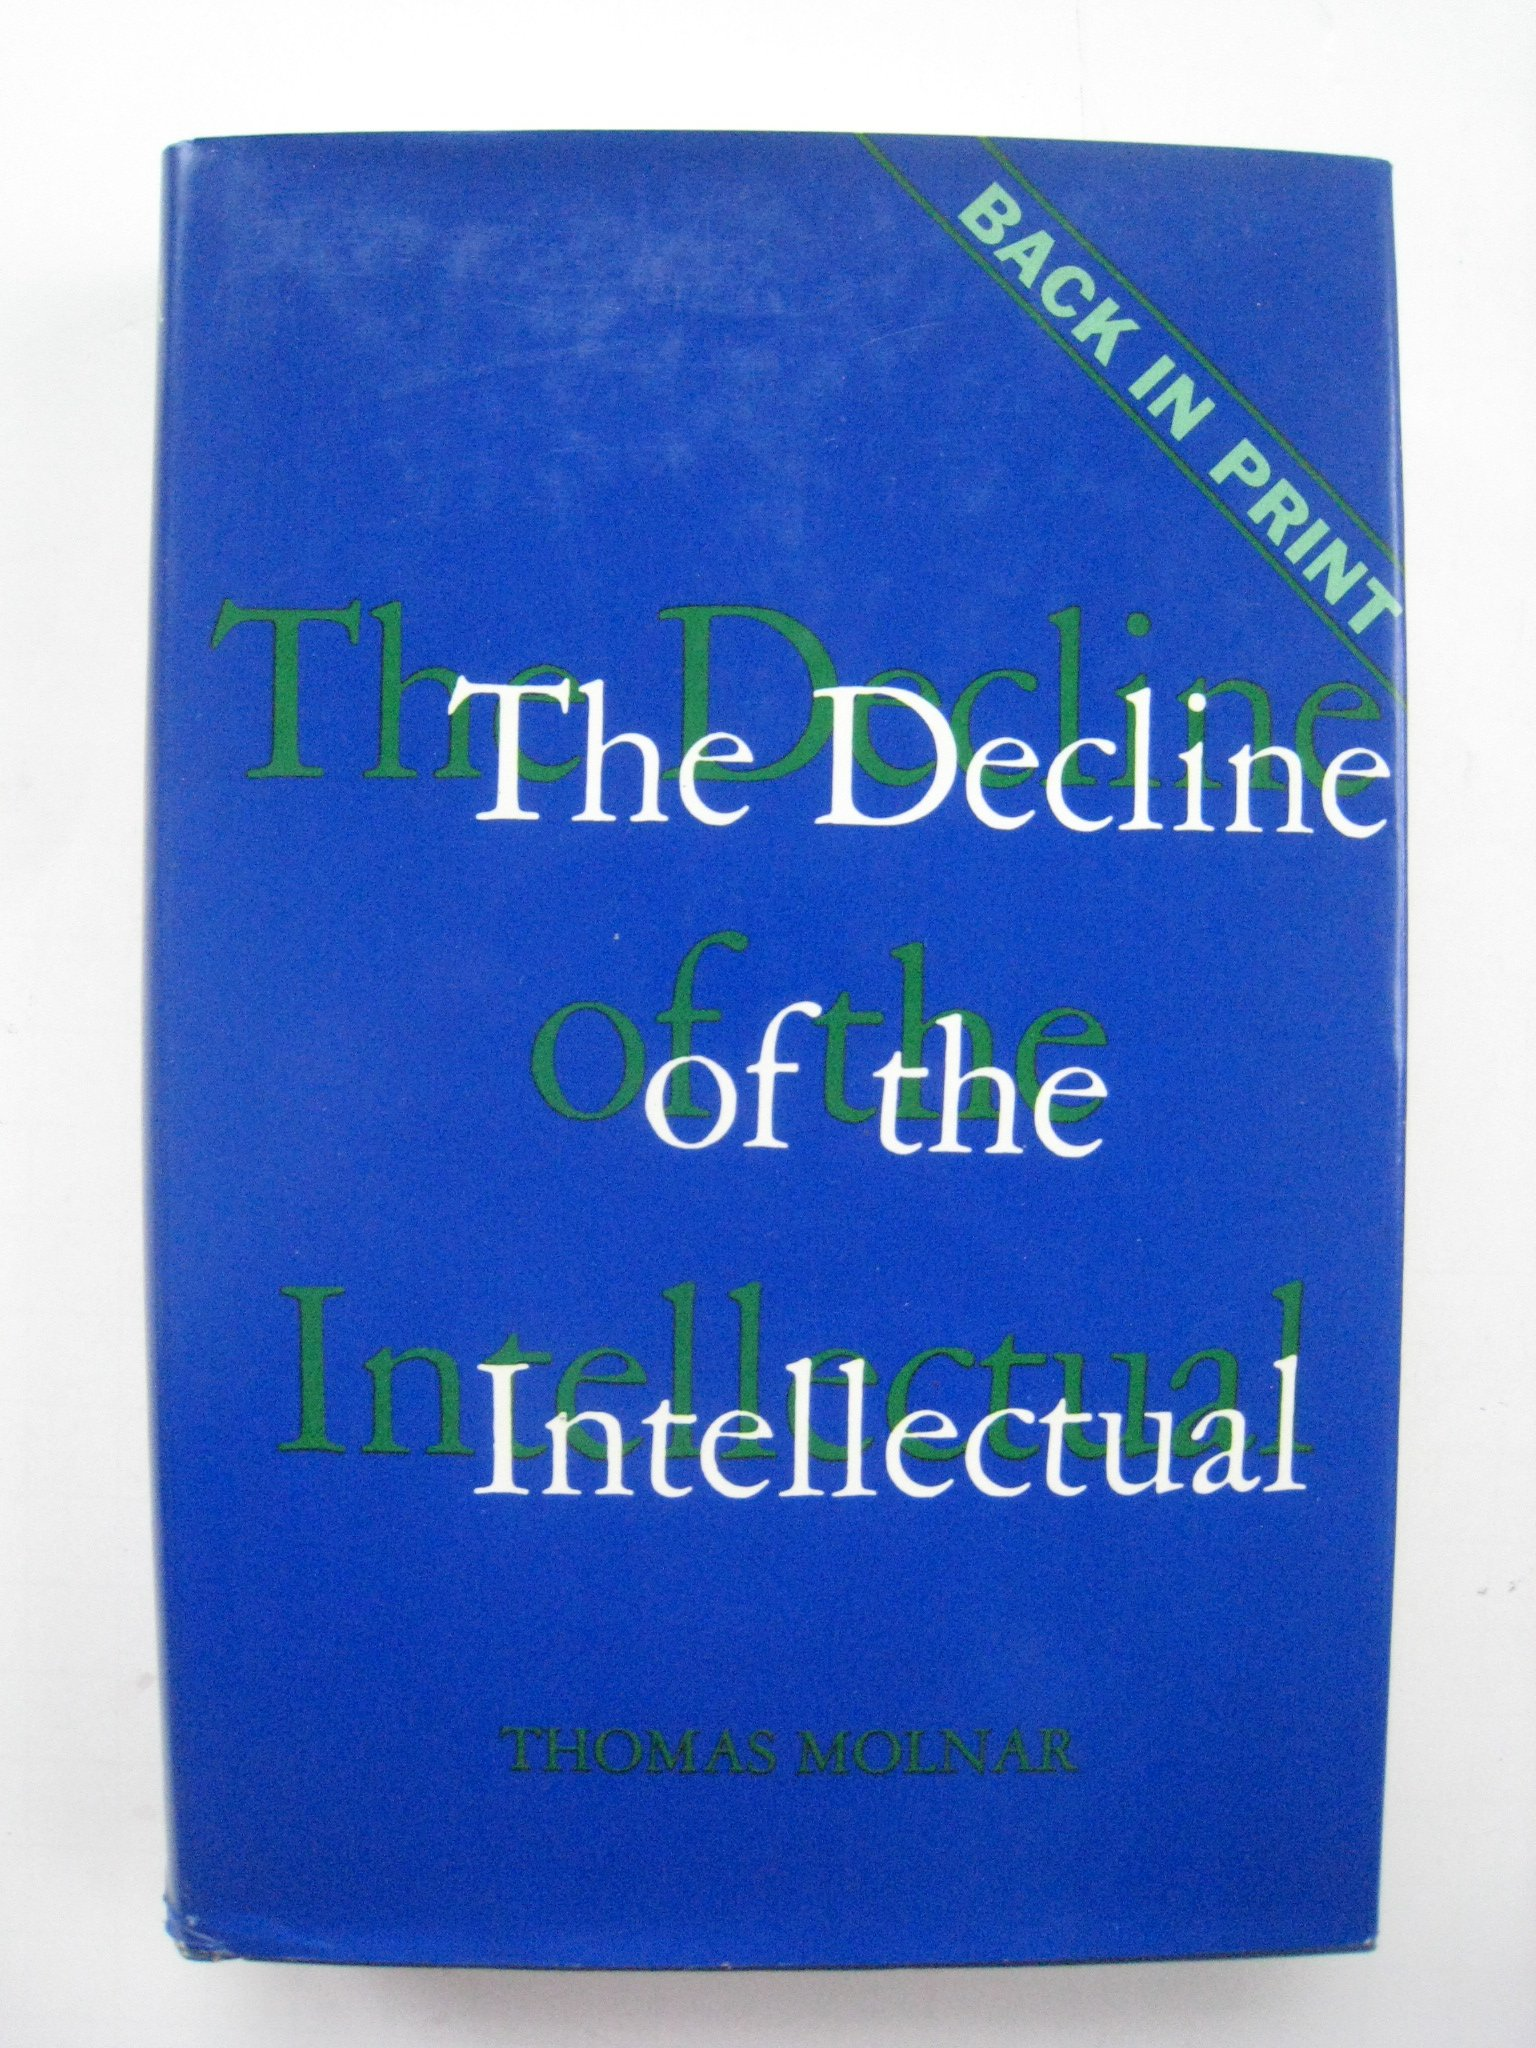 The decline of the intellectual pdf epub